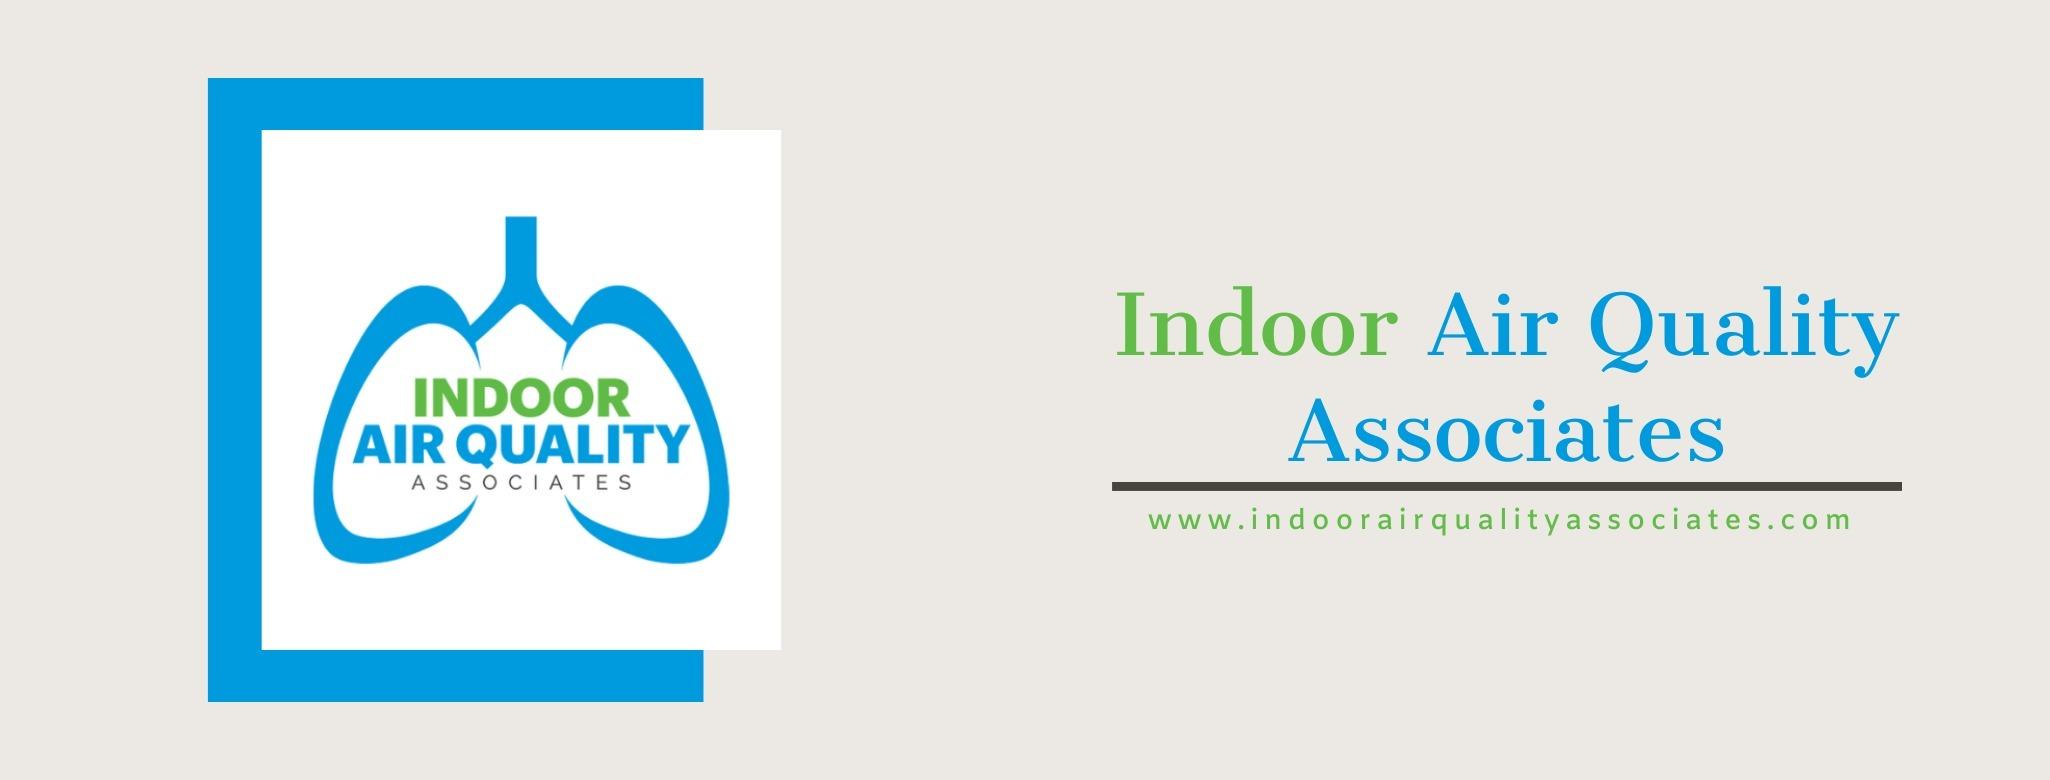 Indoor Air Quality Associates (@indoorairqualityassociates) Cover Image